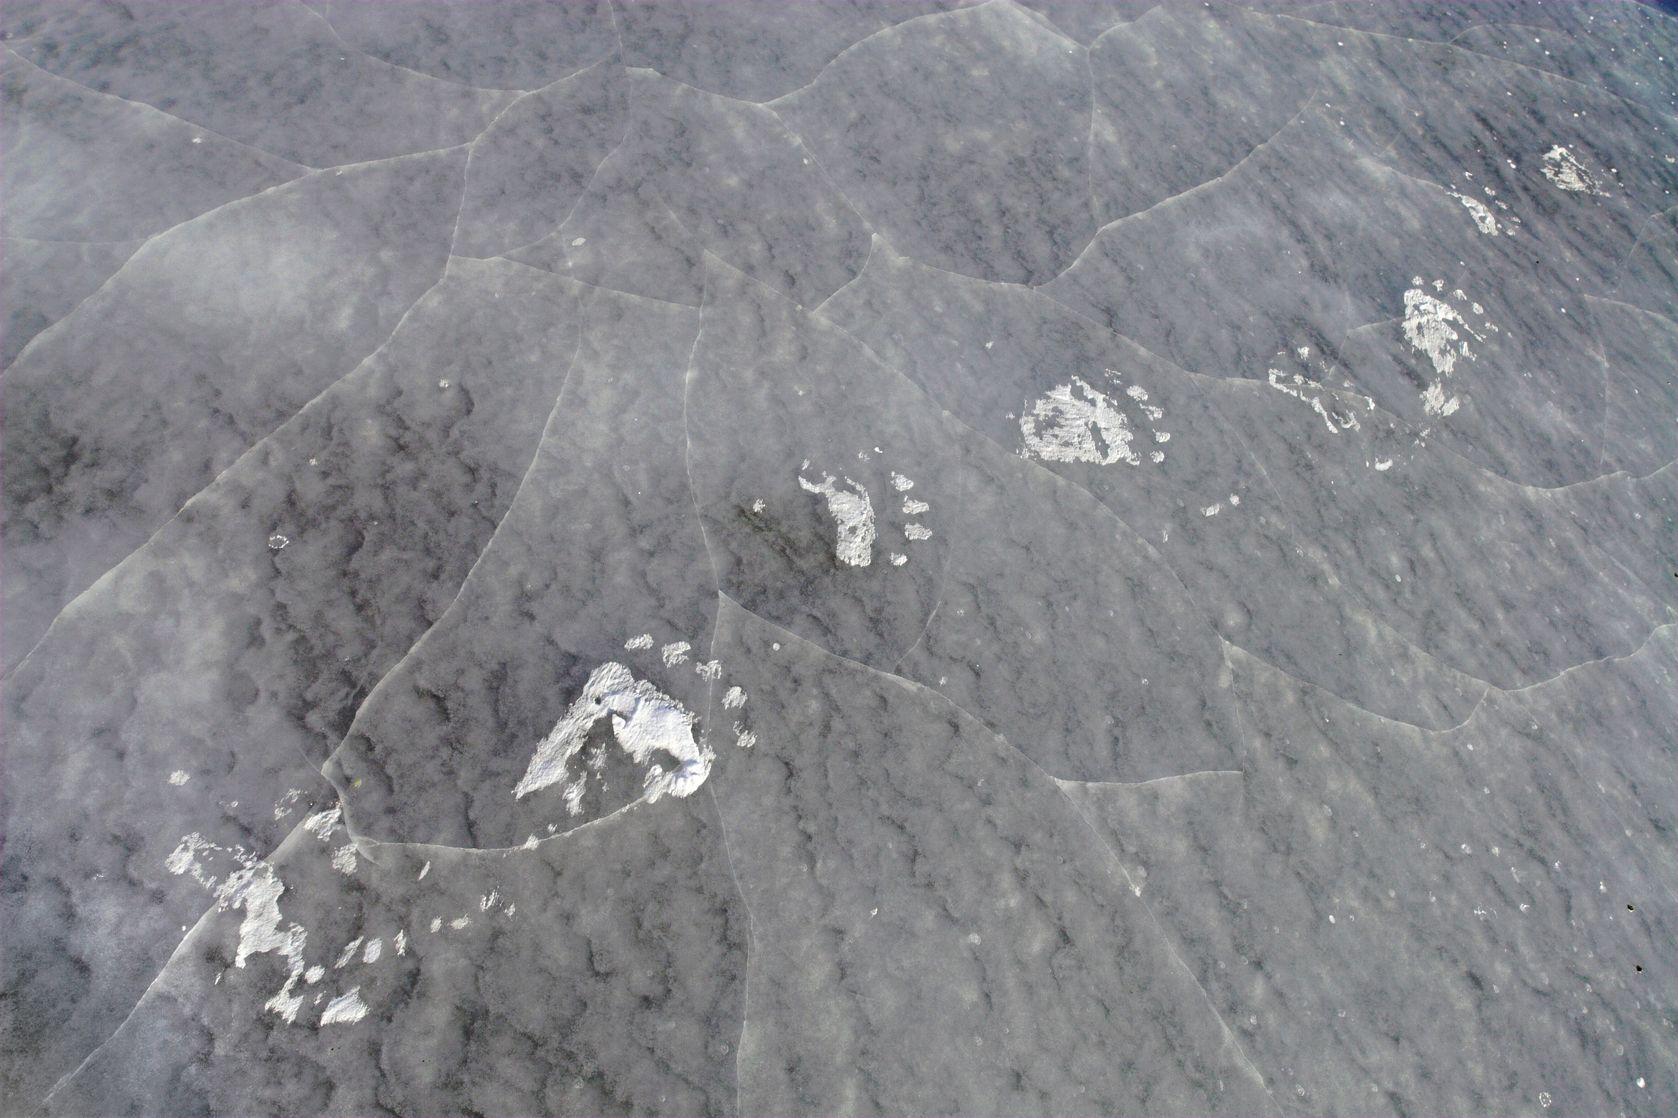 image mosaic in remote sensing practical report pdf